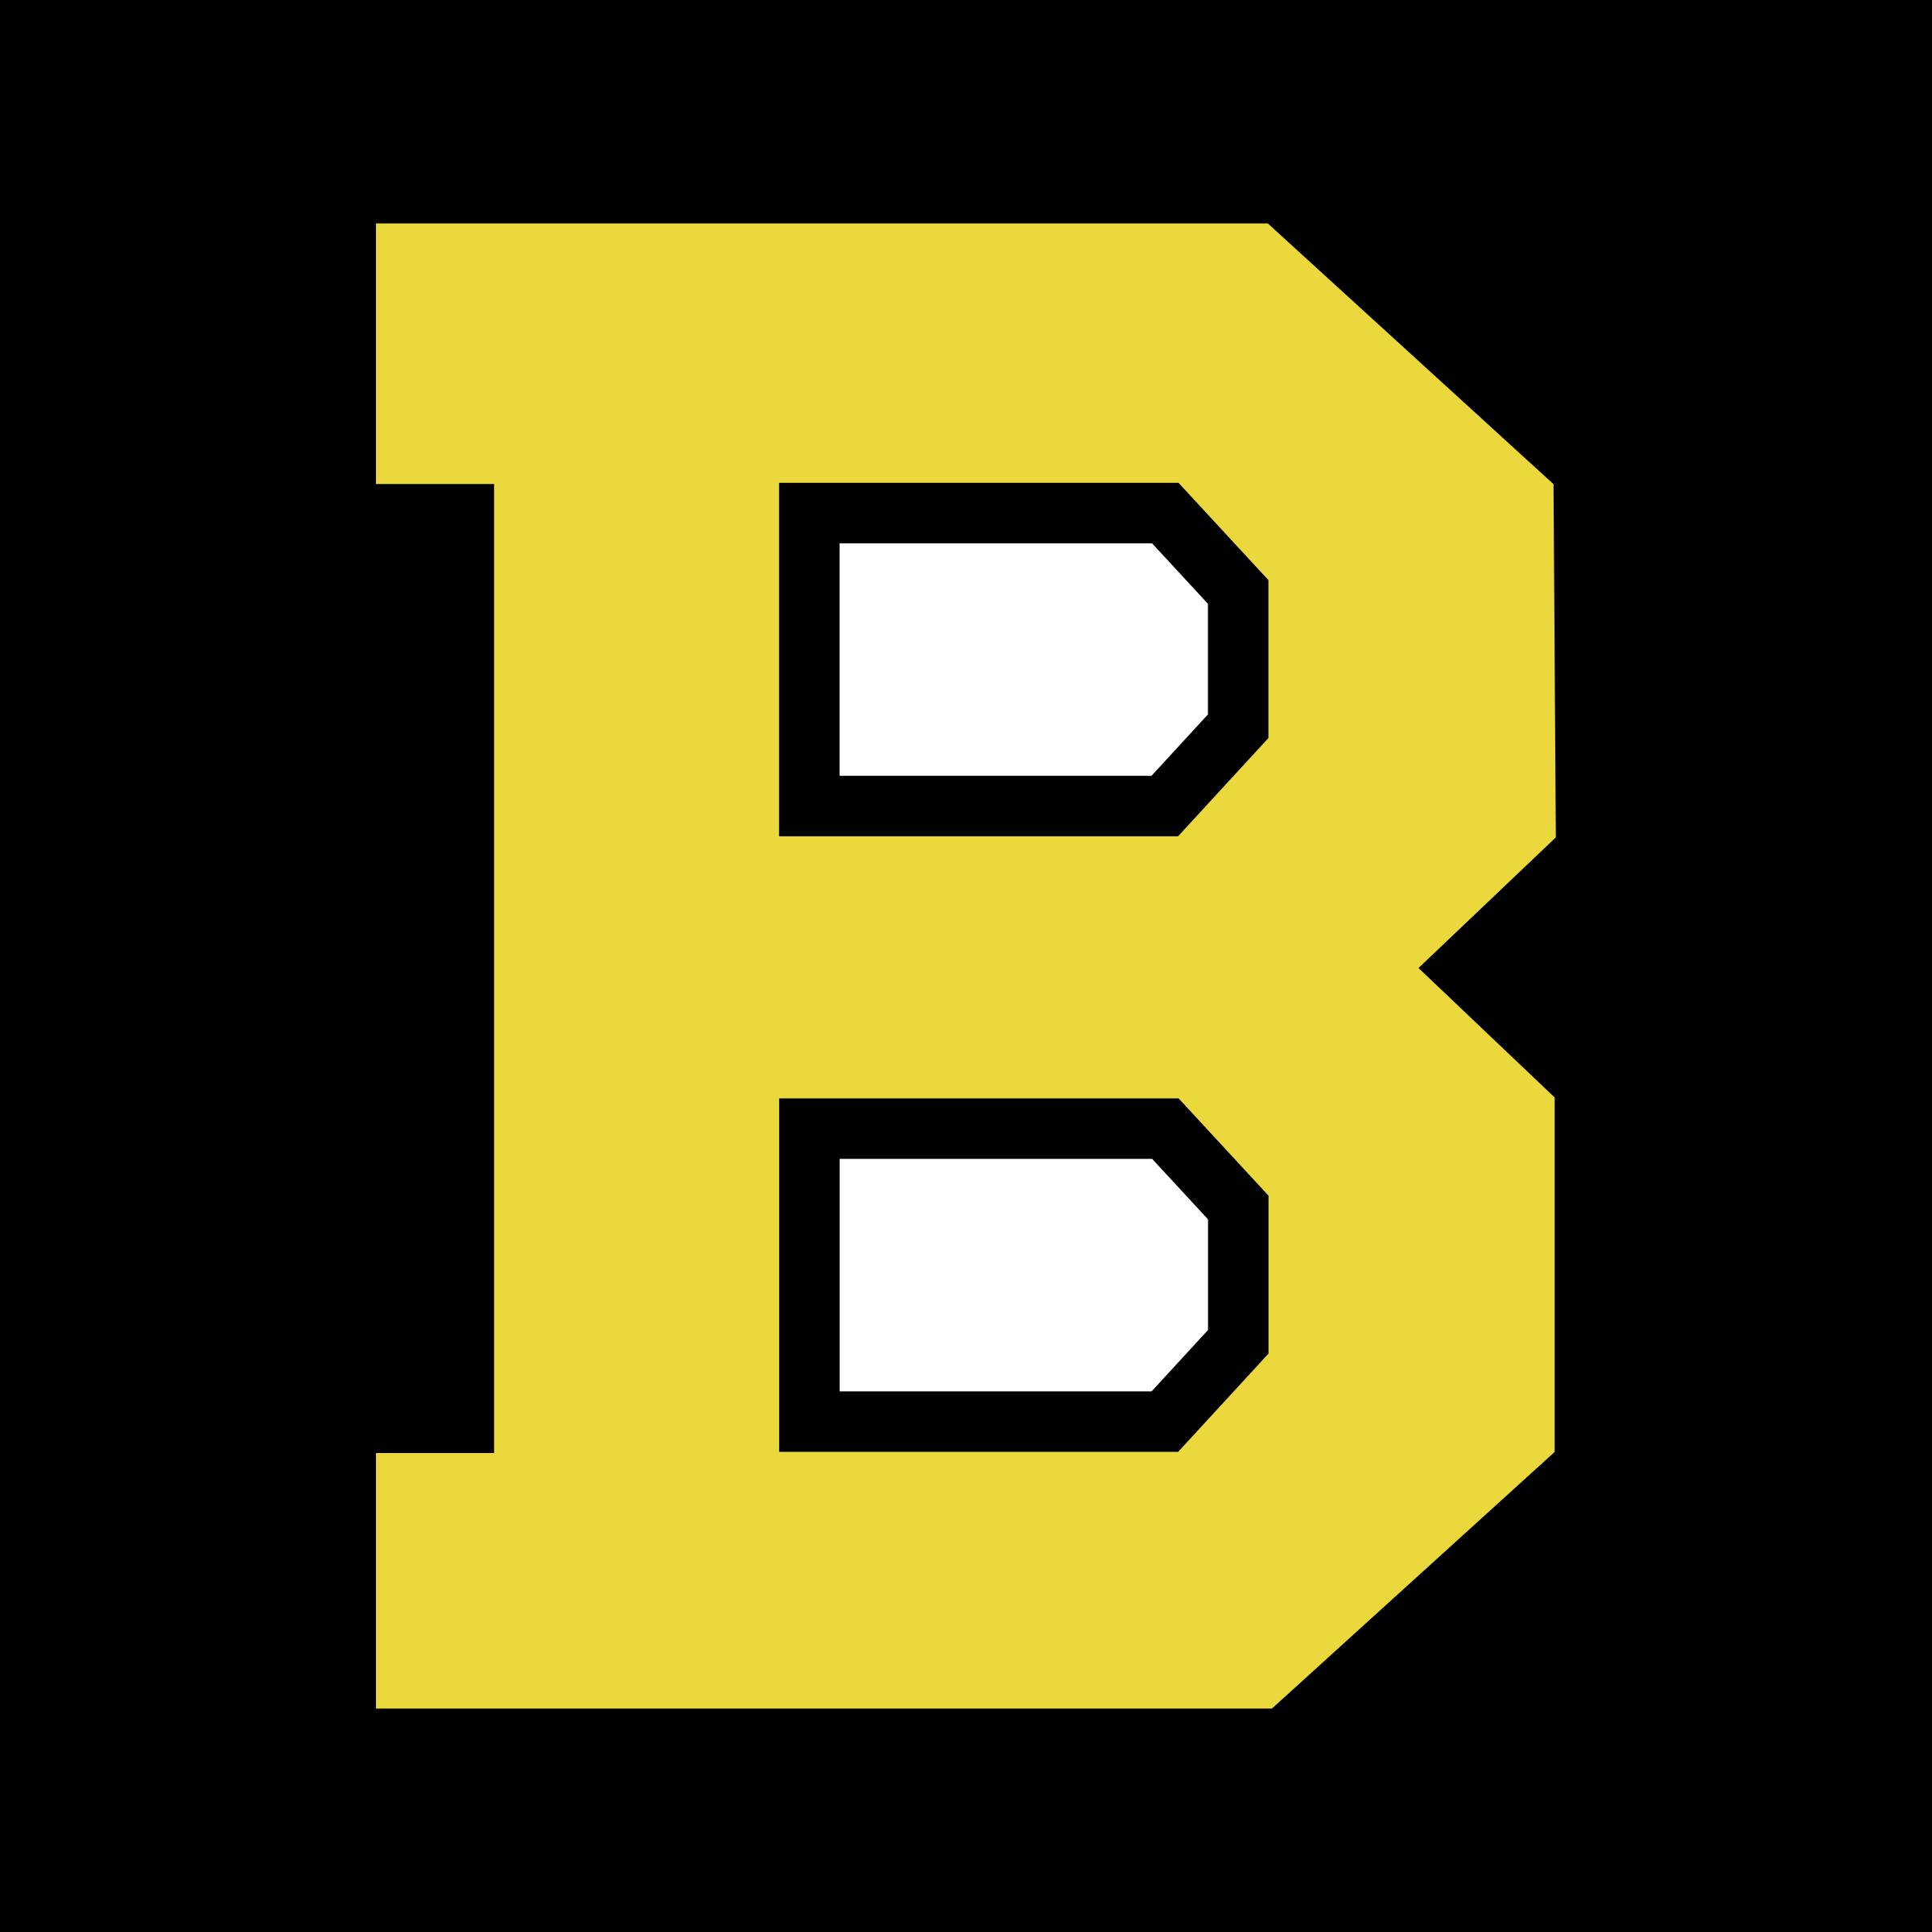 Image Result For Boston Bruins Logo Png Boston Bruins Logo Boston Bruins Bruins